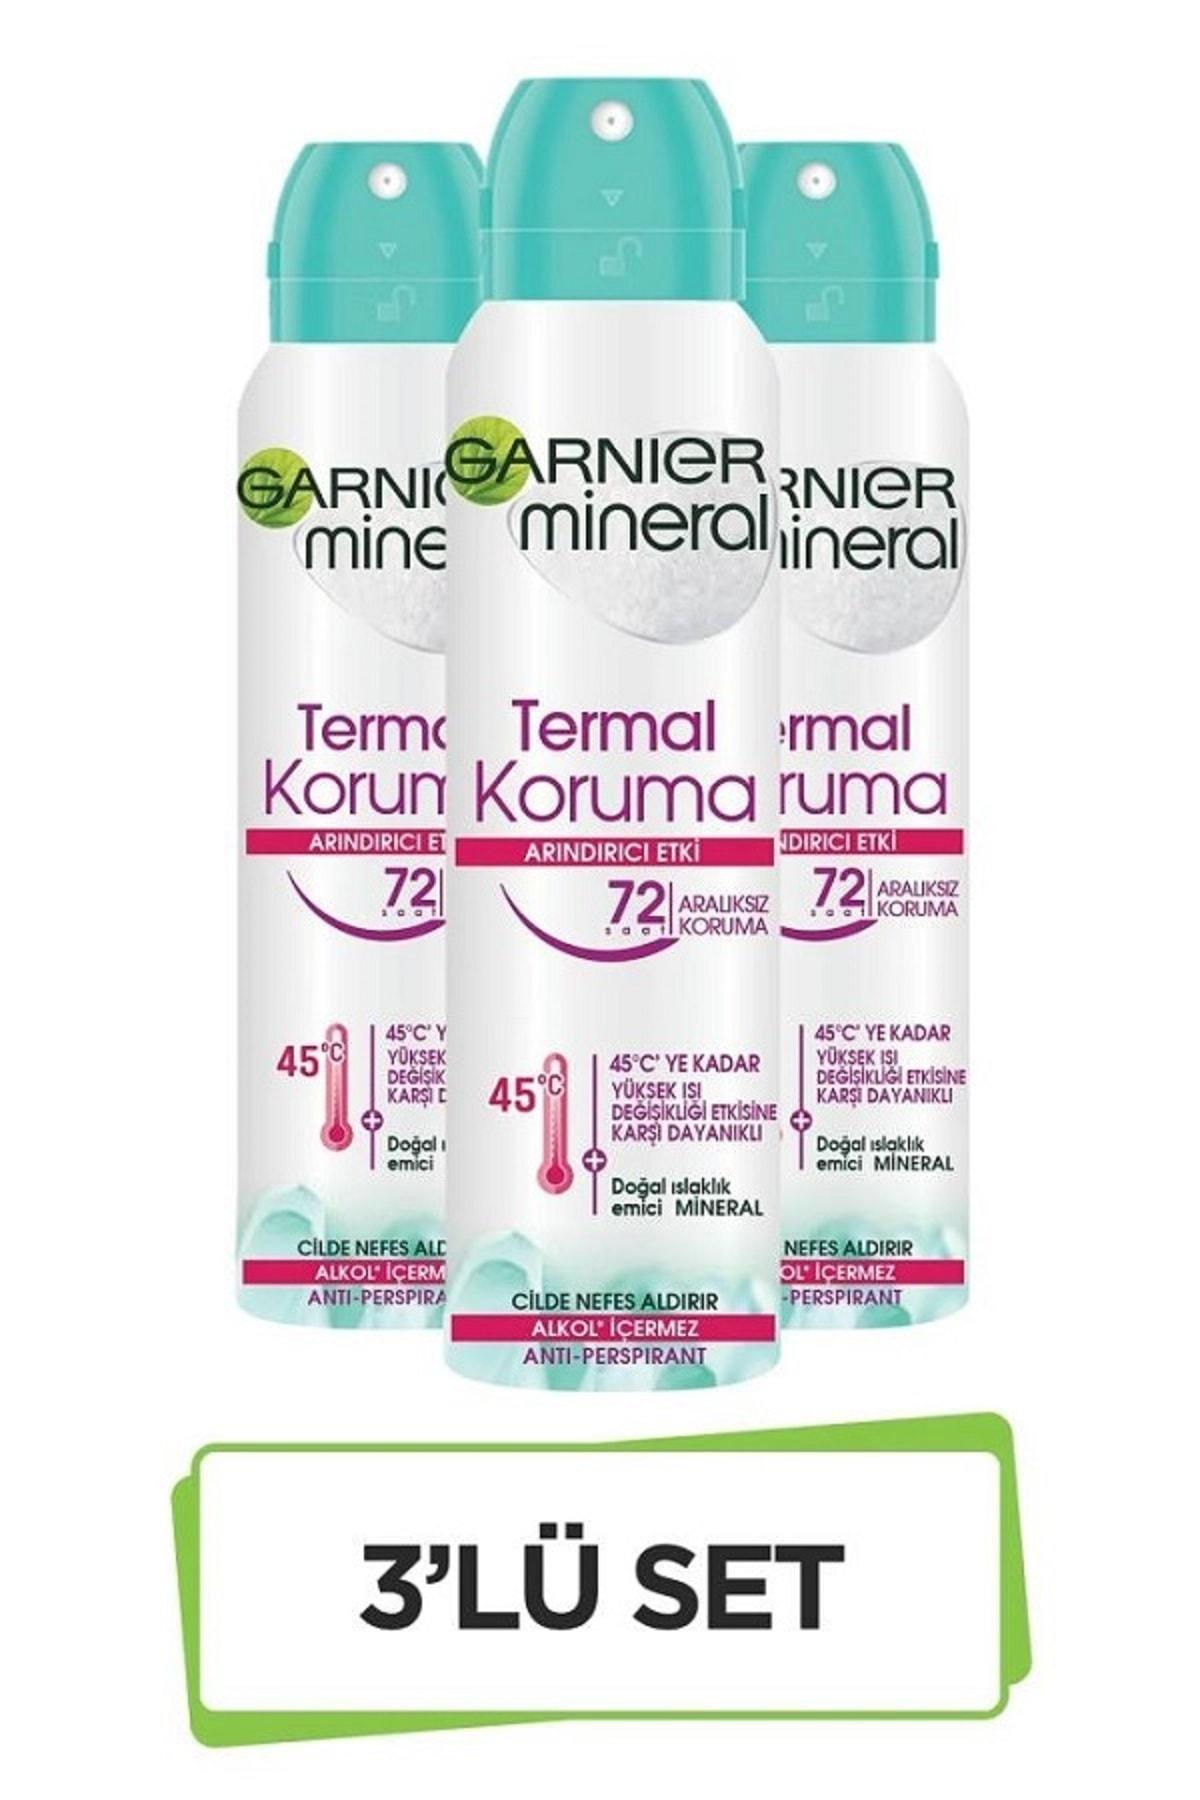 Garnier Mineral Termal Koruma Sprey Deodorant 3'lü Set 36005419288483